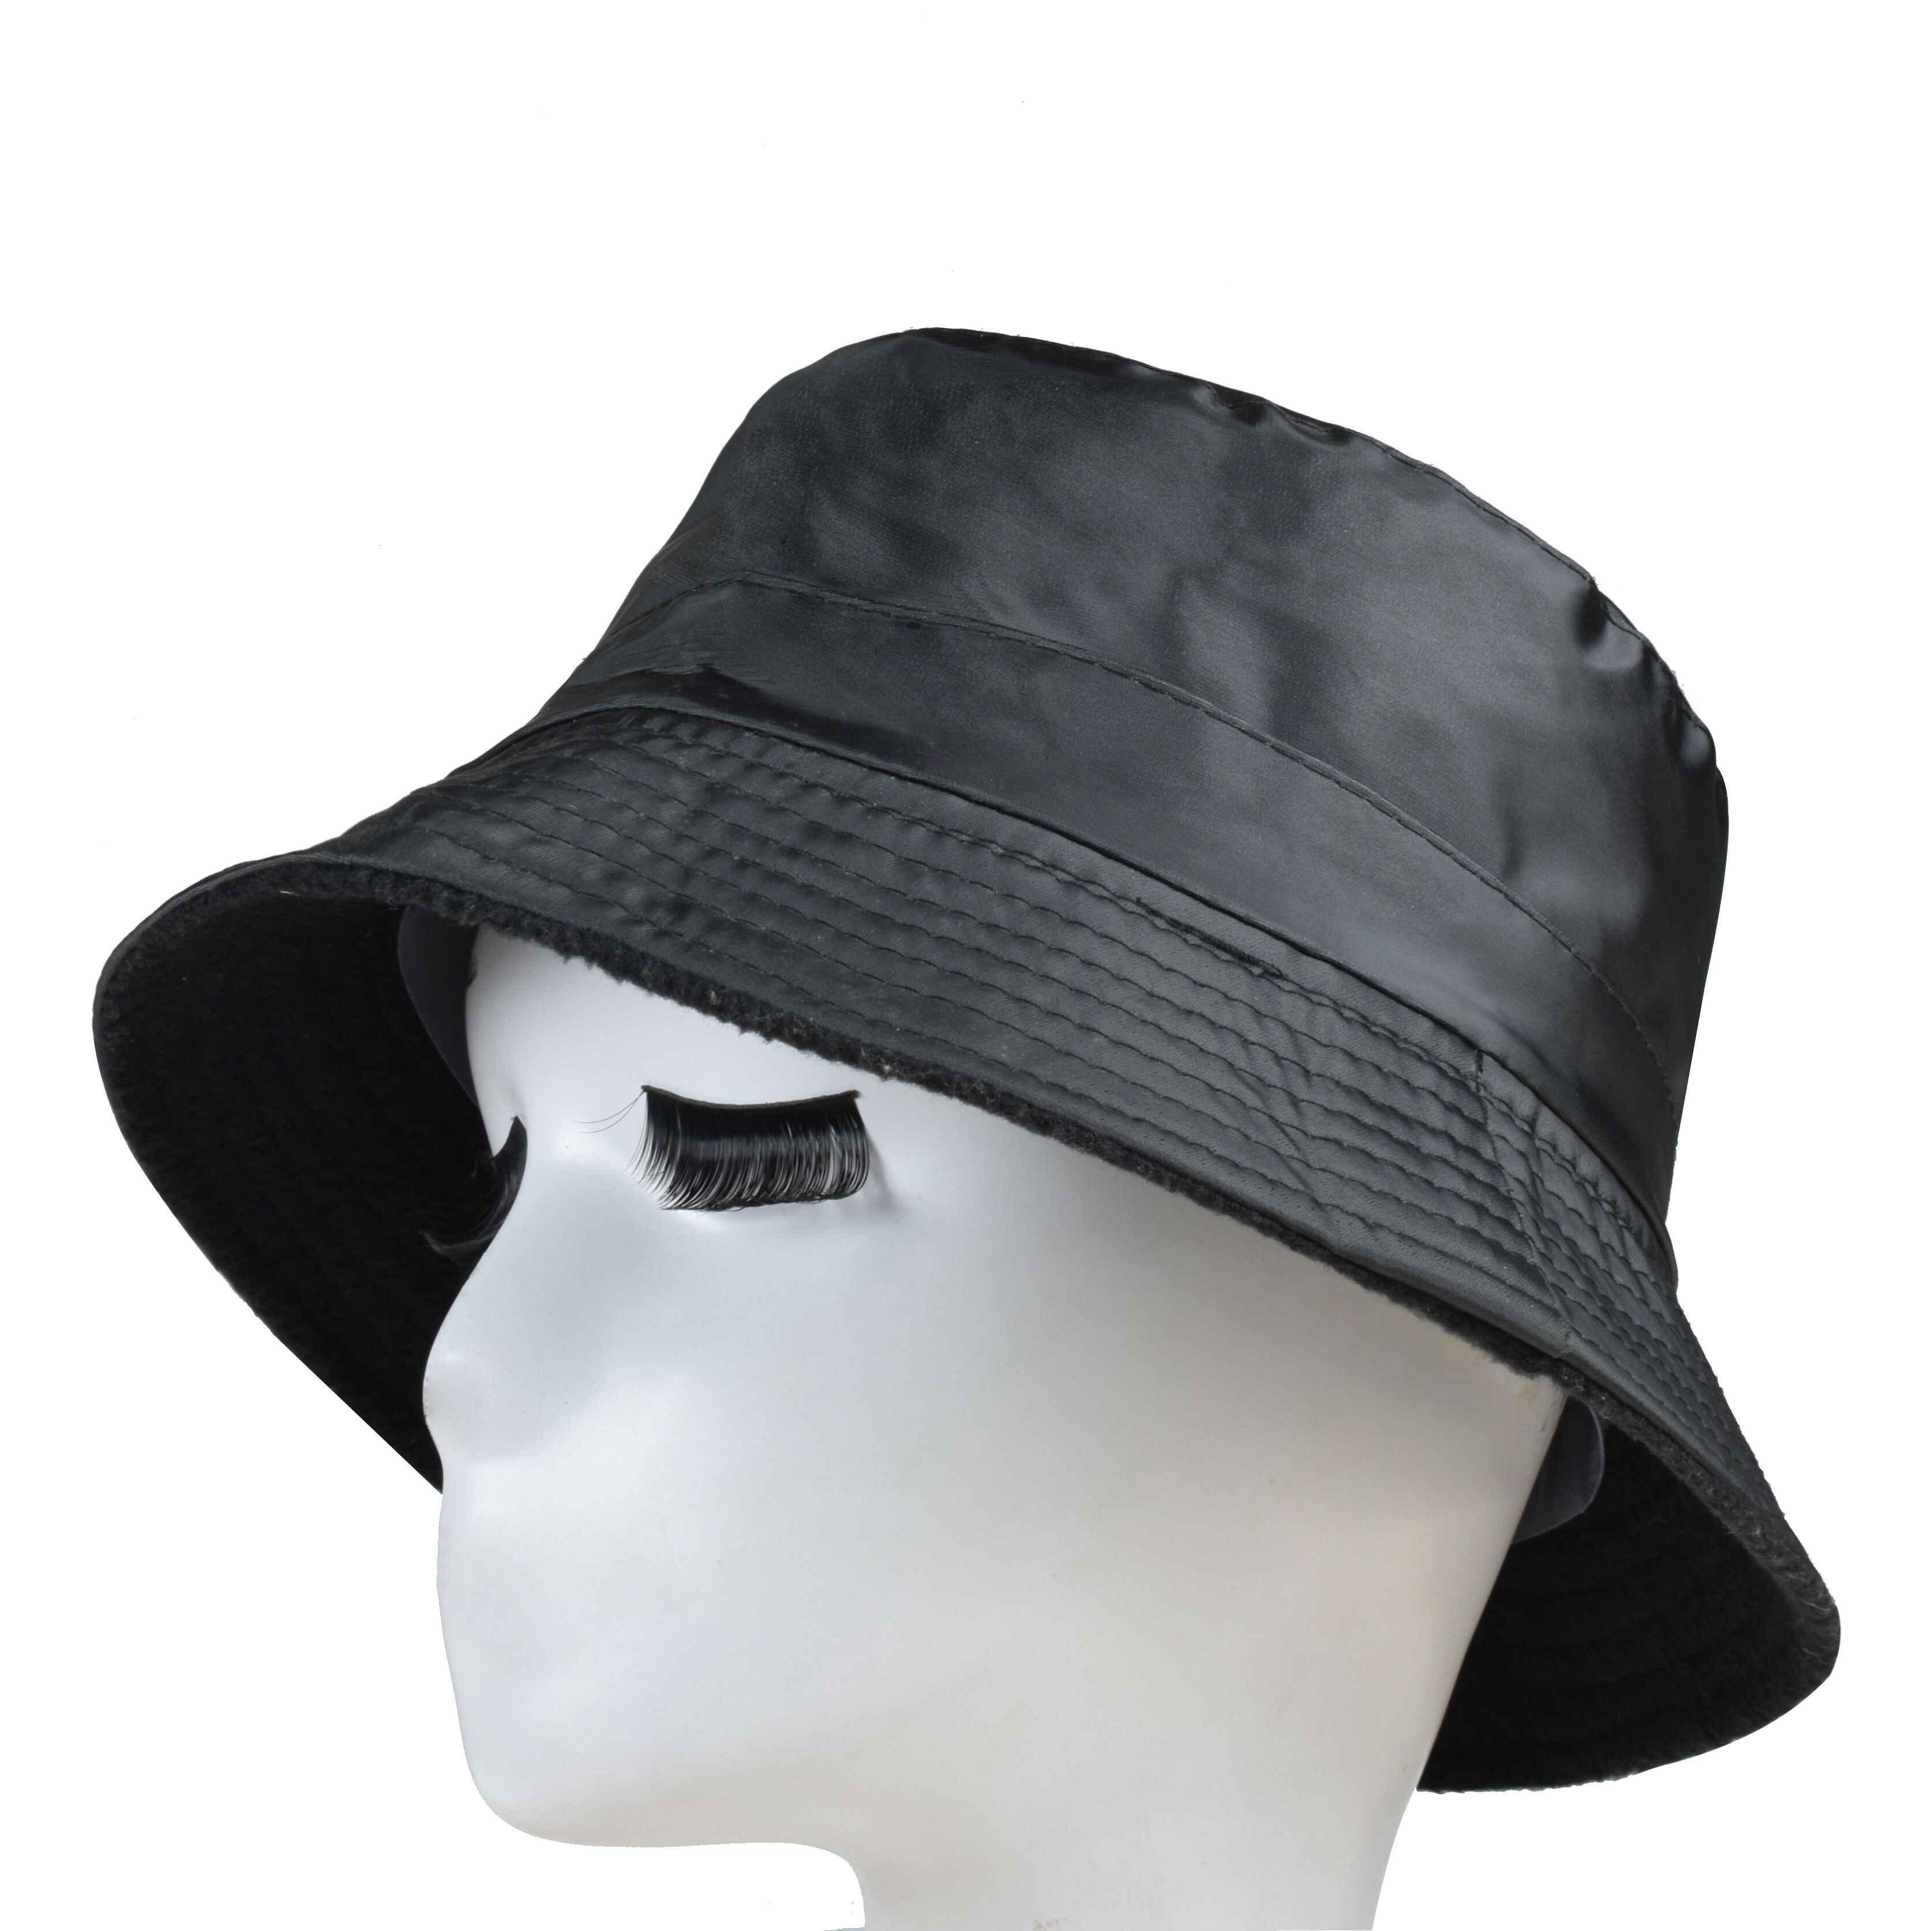 519dd7643 URQ Summer Bucket hats for Man Woman Outdoor Fishing Wide Brim Hat Rain  Caps Men Hiking Sombrero Gorro Hats ZZ4026